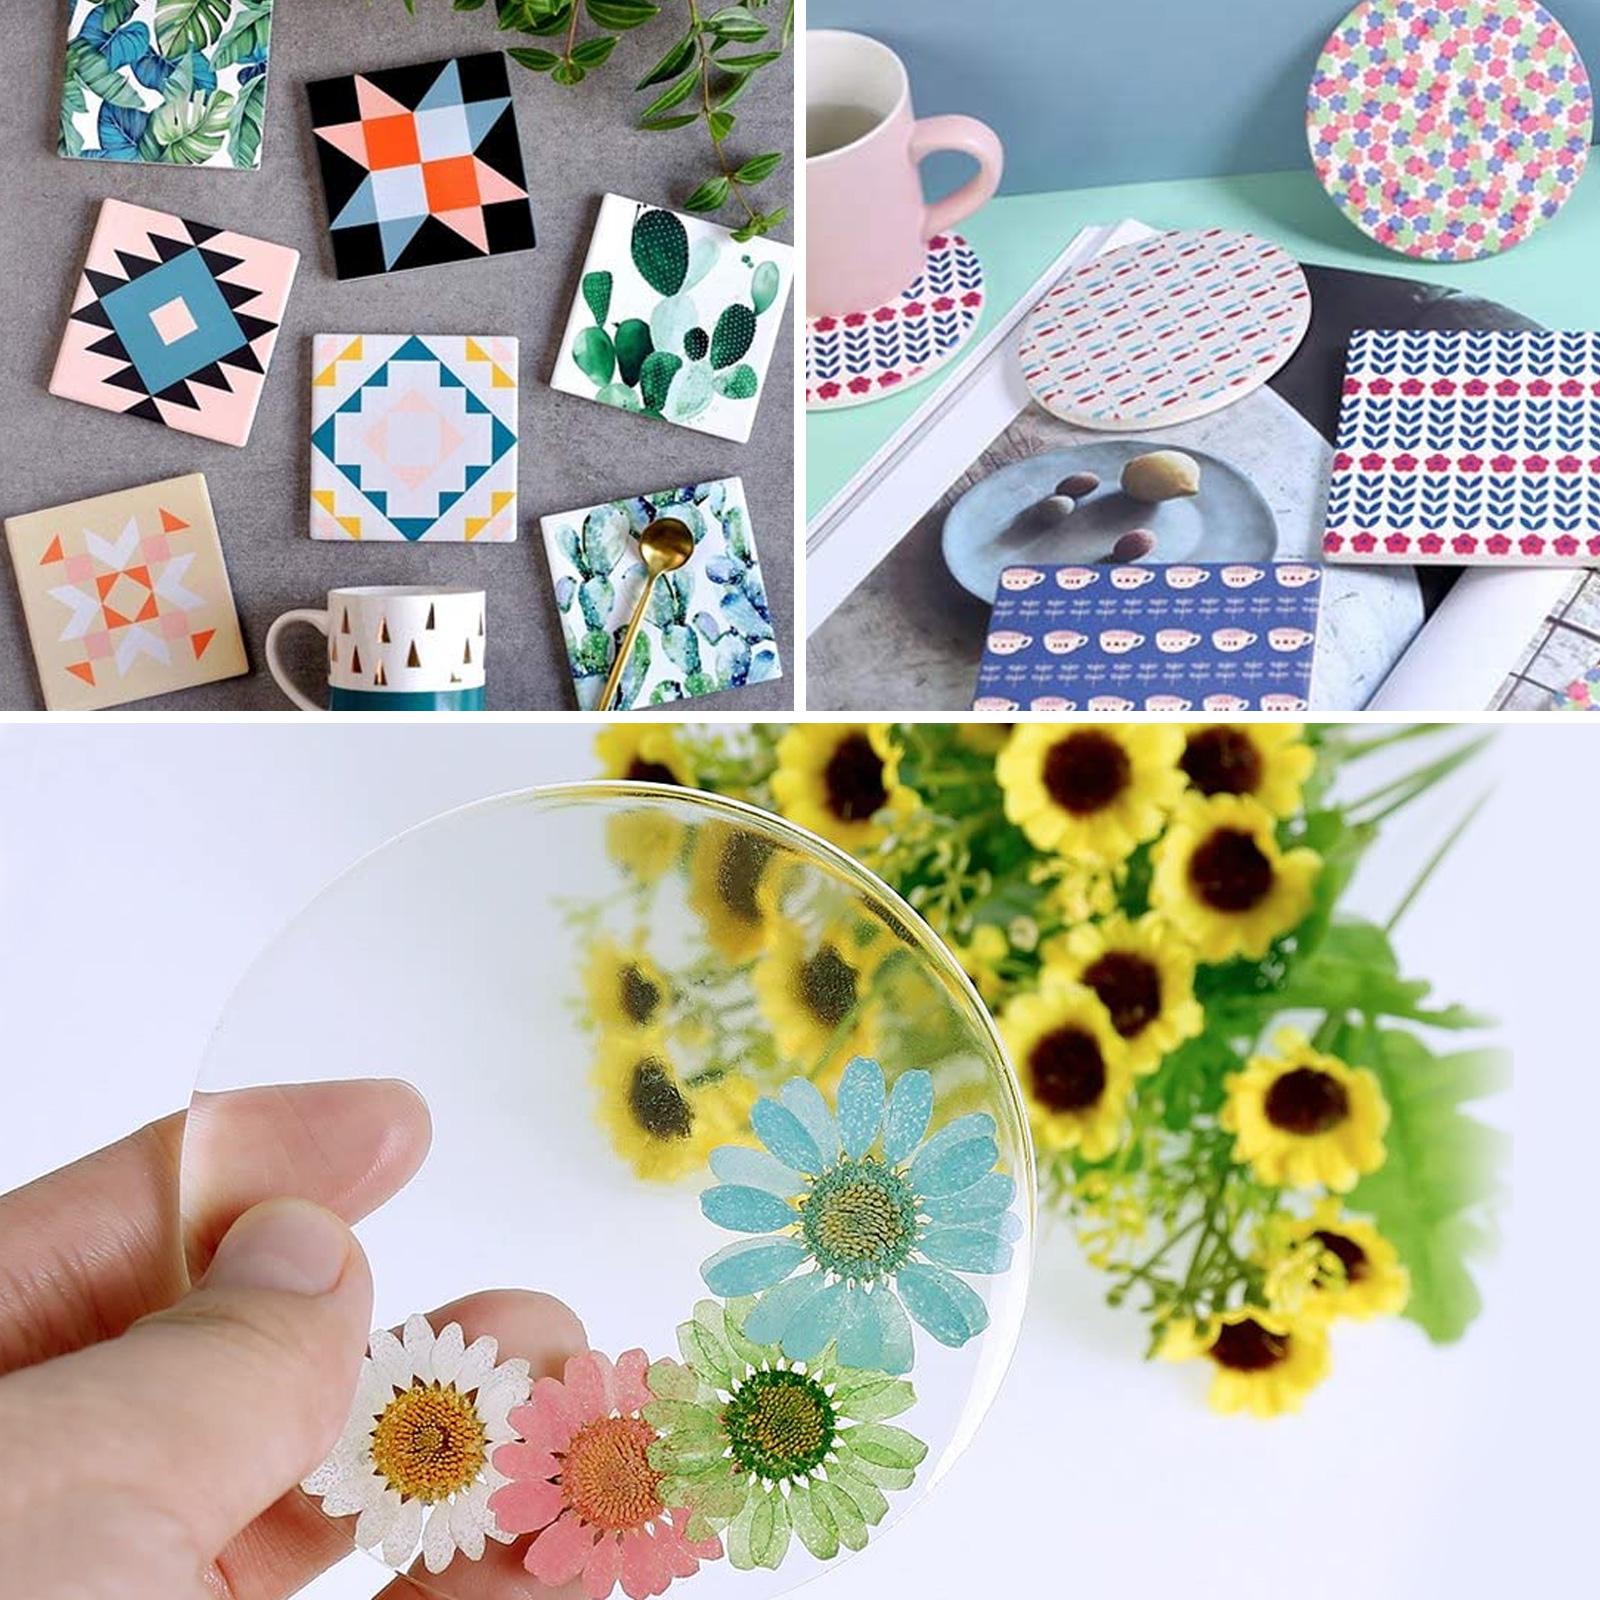 Silicone-Resin-Molds-Epoxy-Casting-Art-Coaster-Ashtray-Bowl-Mat-DIY-Craft-Tool thumbnail 4